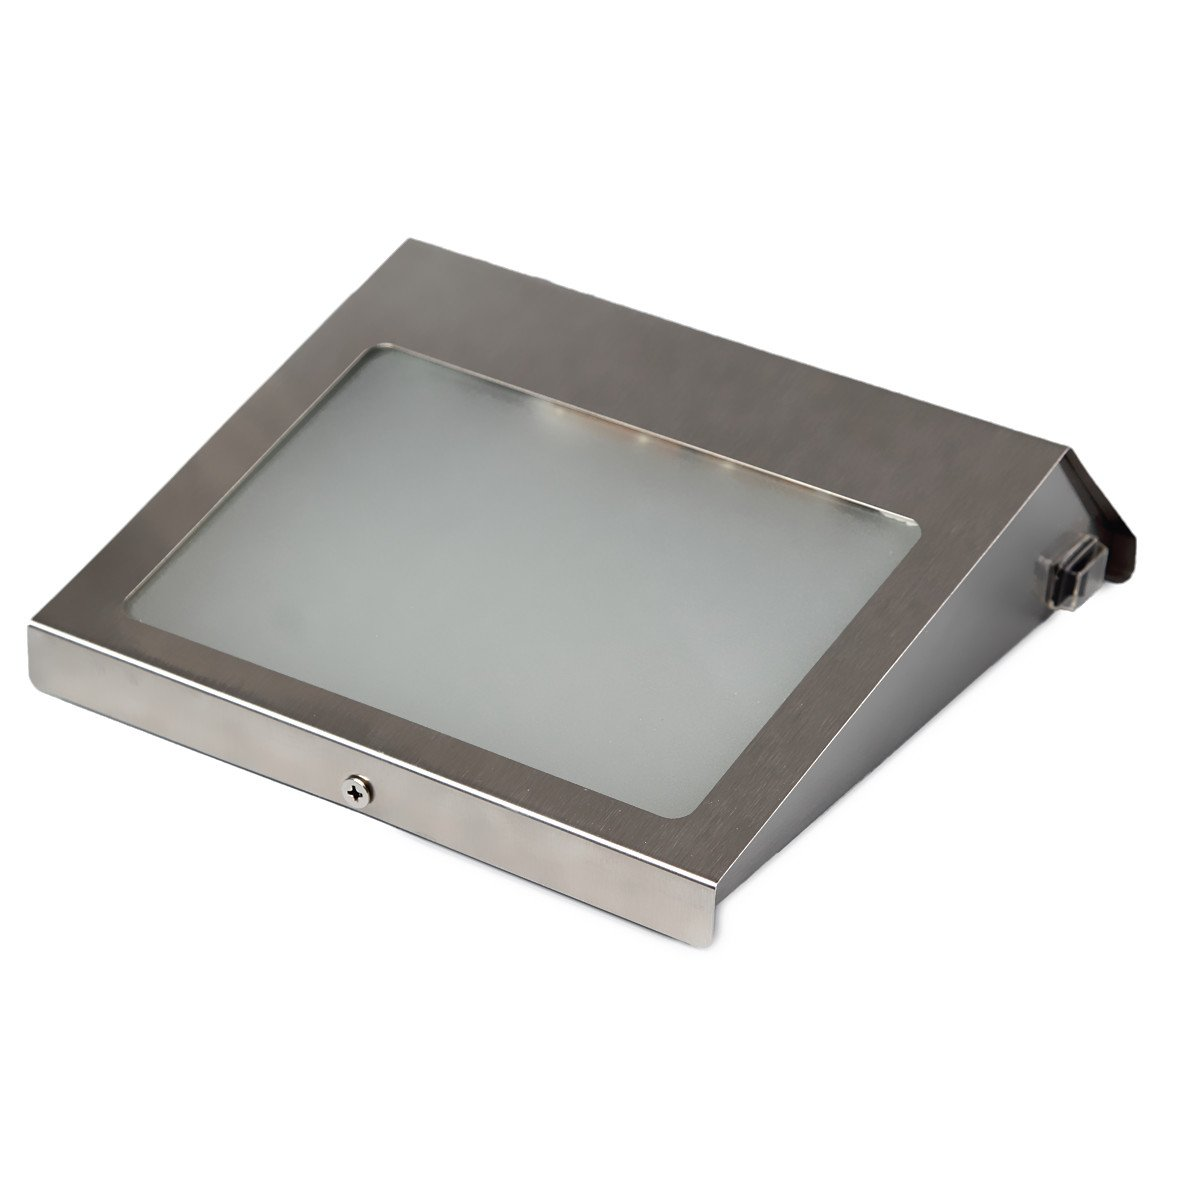 Amazon.com: ZRUI LED luz solar IP65 resistente al agua al ...